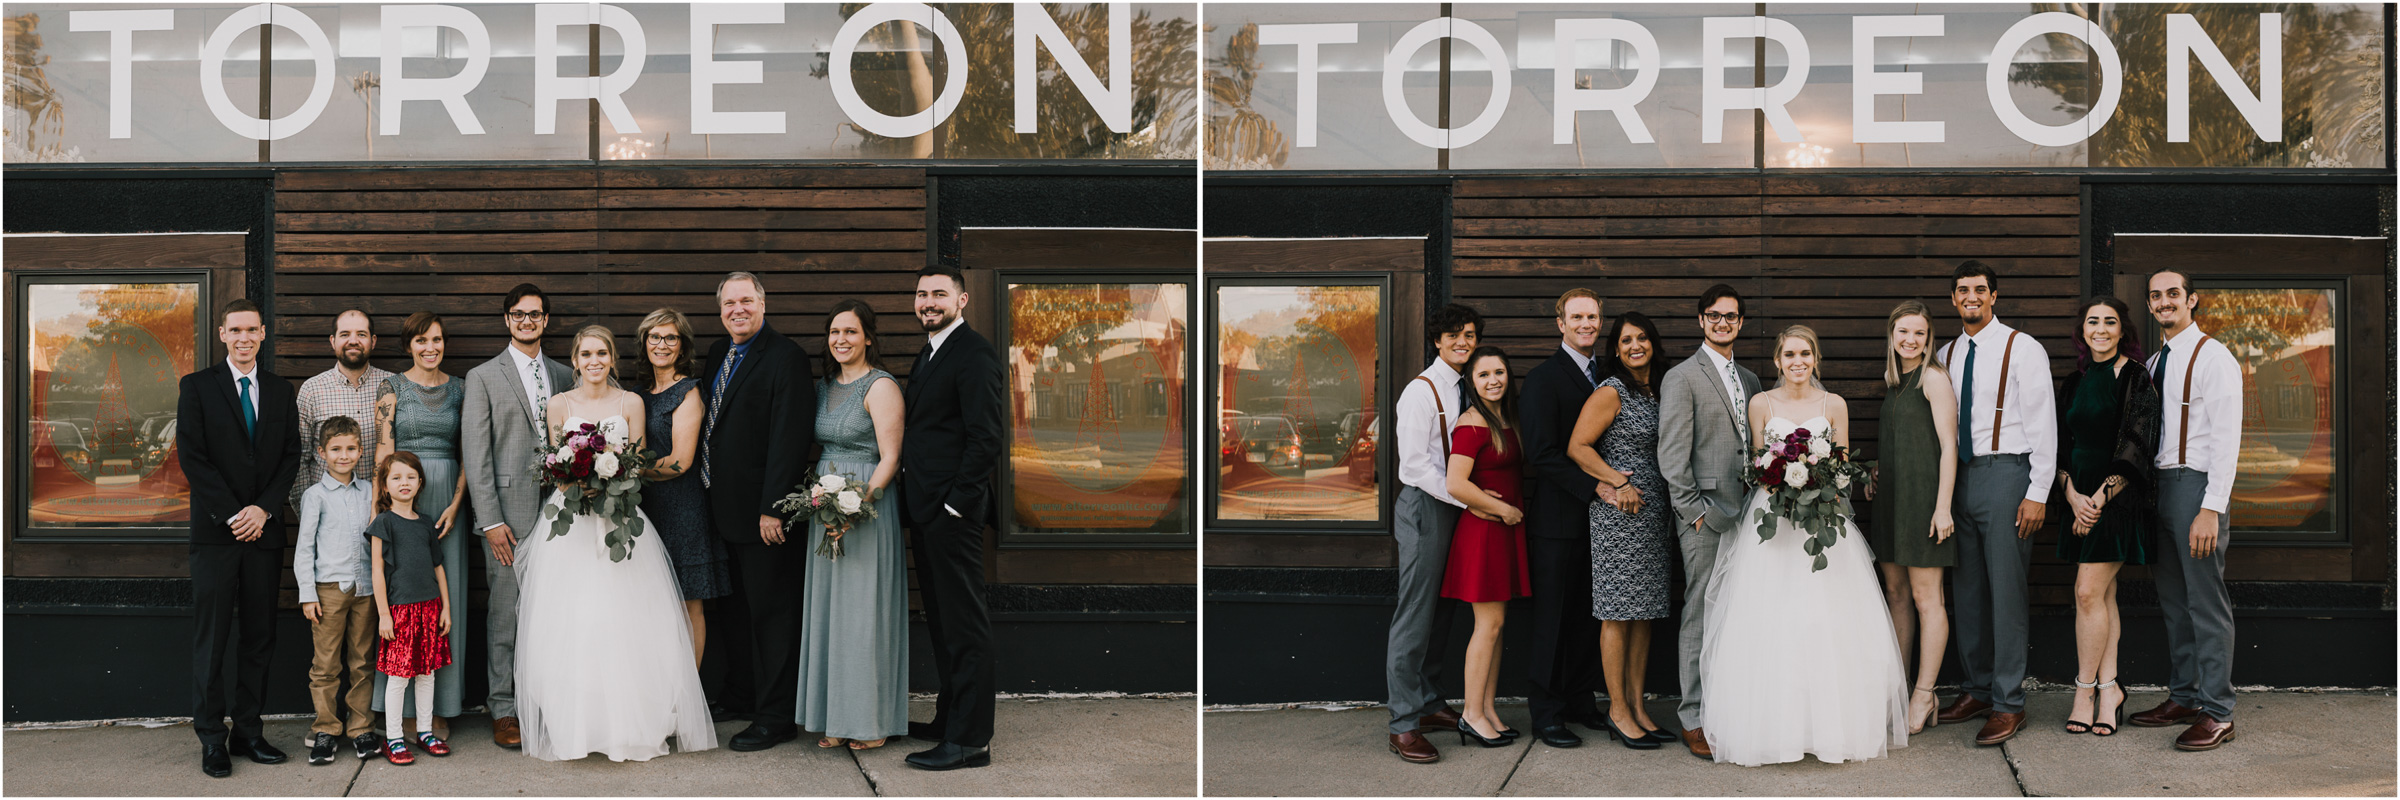 alyssa barletter photography midtown kansas city wedding el torreon kcmo fall october wedding photography-32.jpg